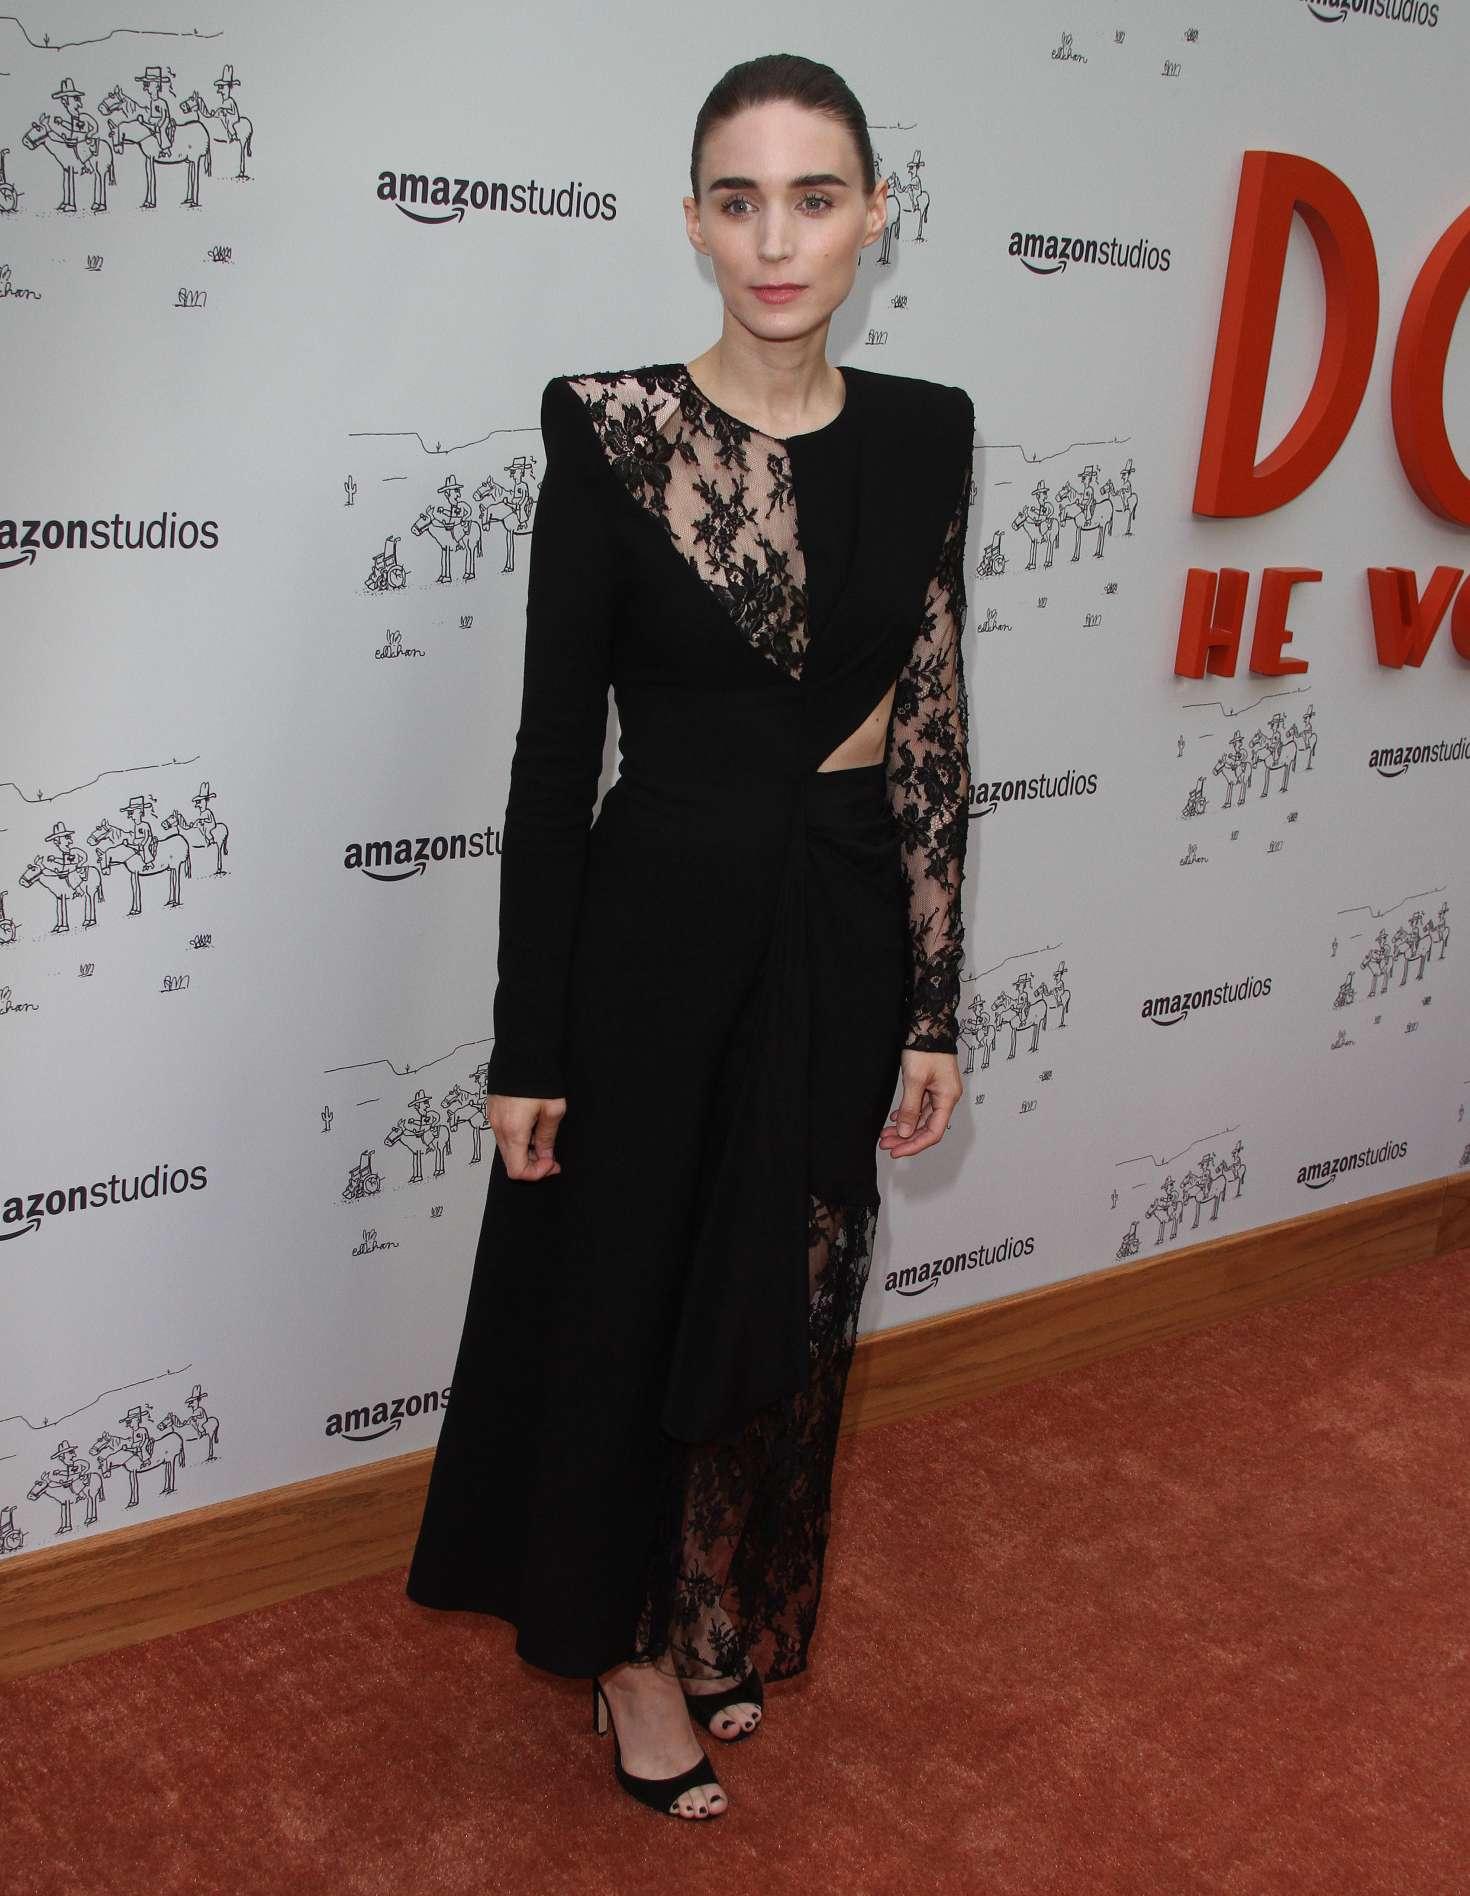 Rooney Mara 2018 : Rooney Mara: Dont Worry Premiere -10